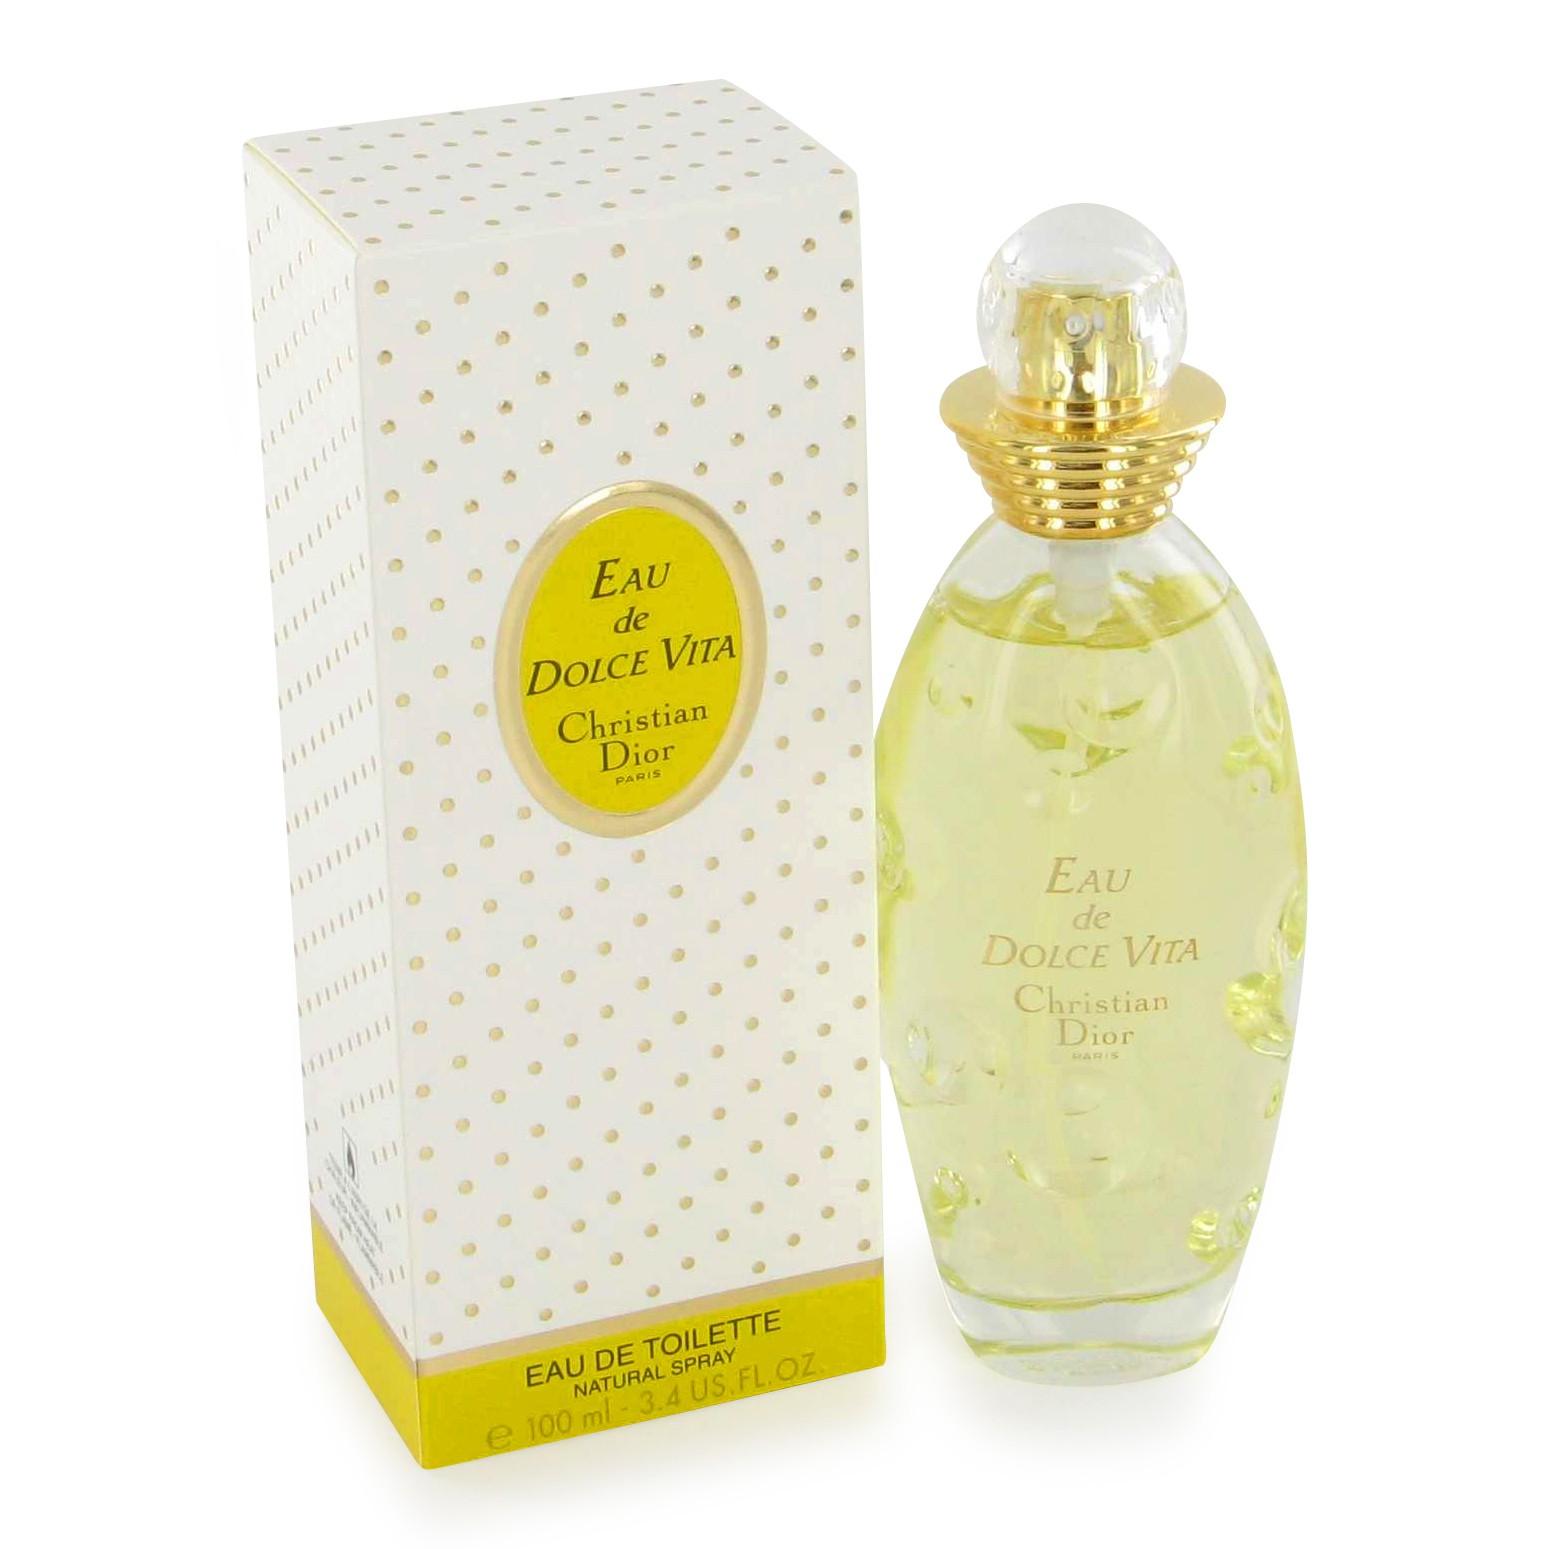 Dior Eau De Dolce Vita аромат для женщин